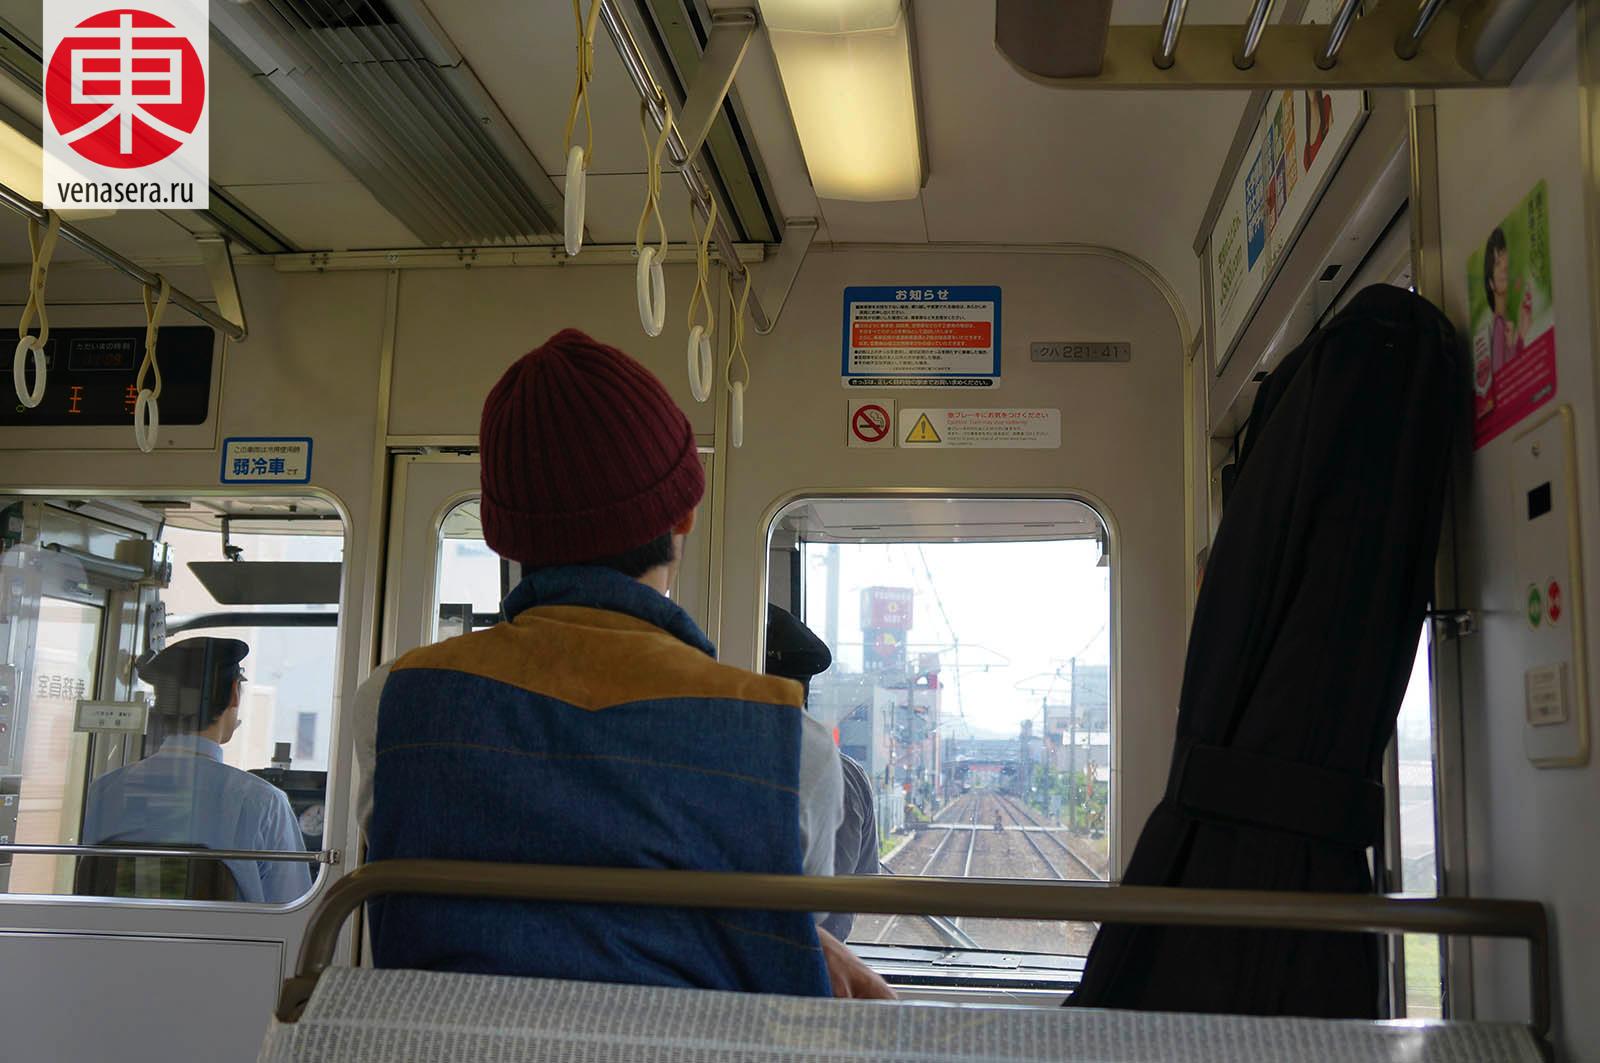 Поездка в Нара, Нара, Nara, 奈良, Япония, Japan, 日本.